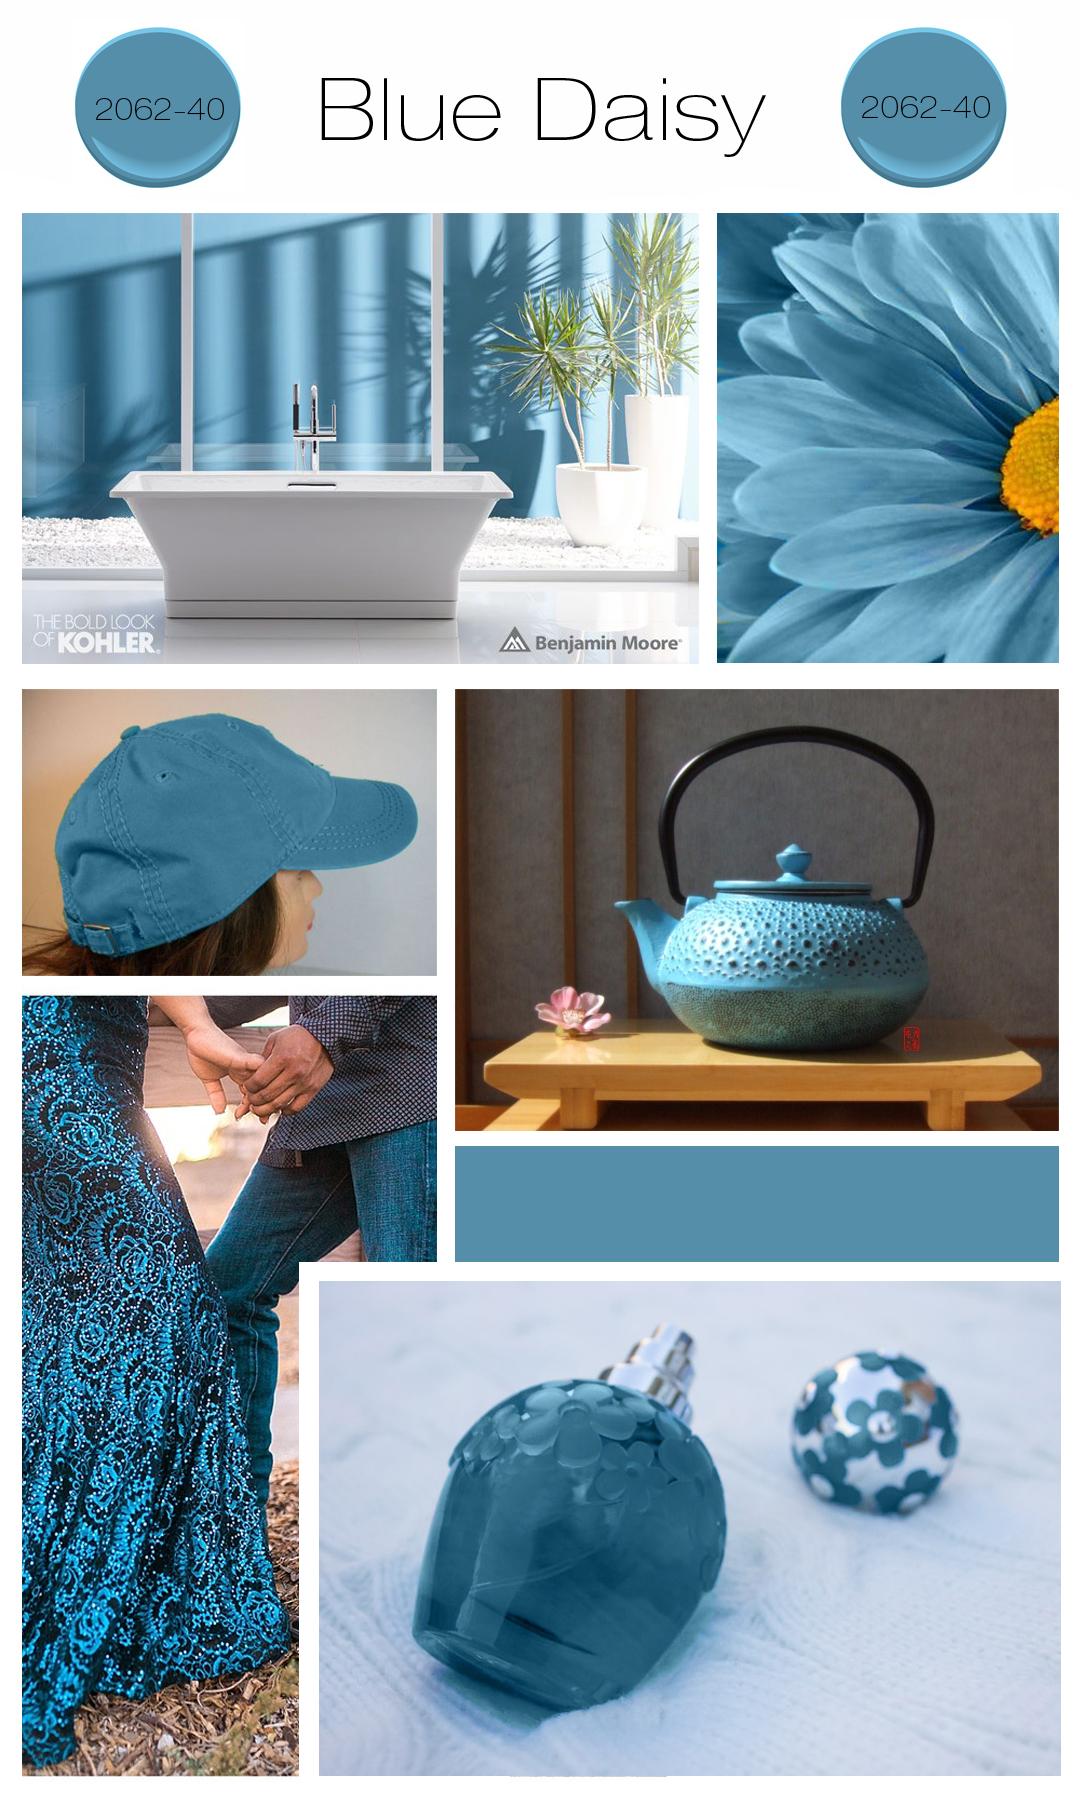 01_benjamin_moore_blue_daisy_2062-40